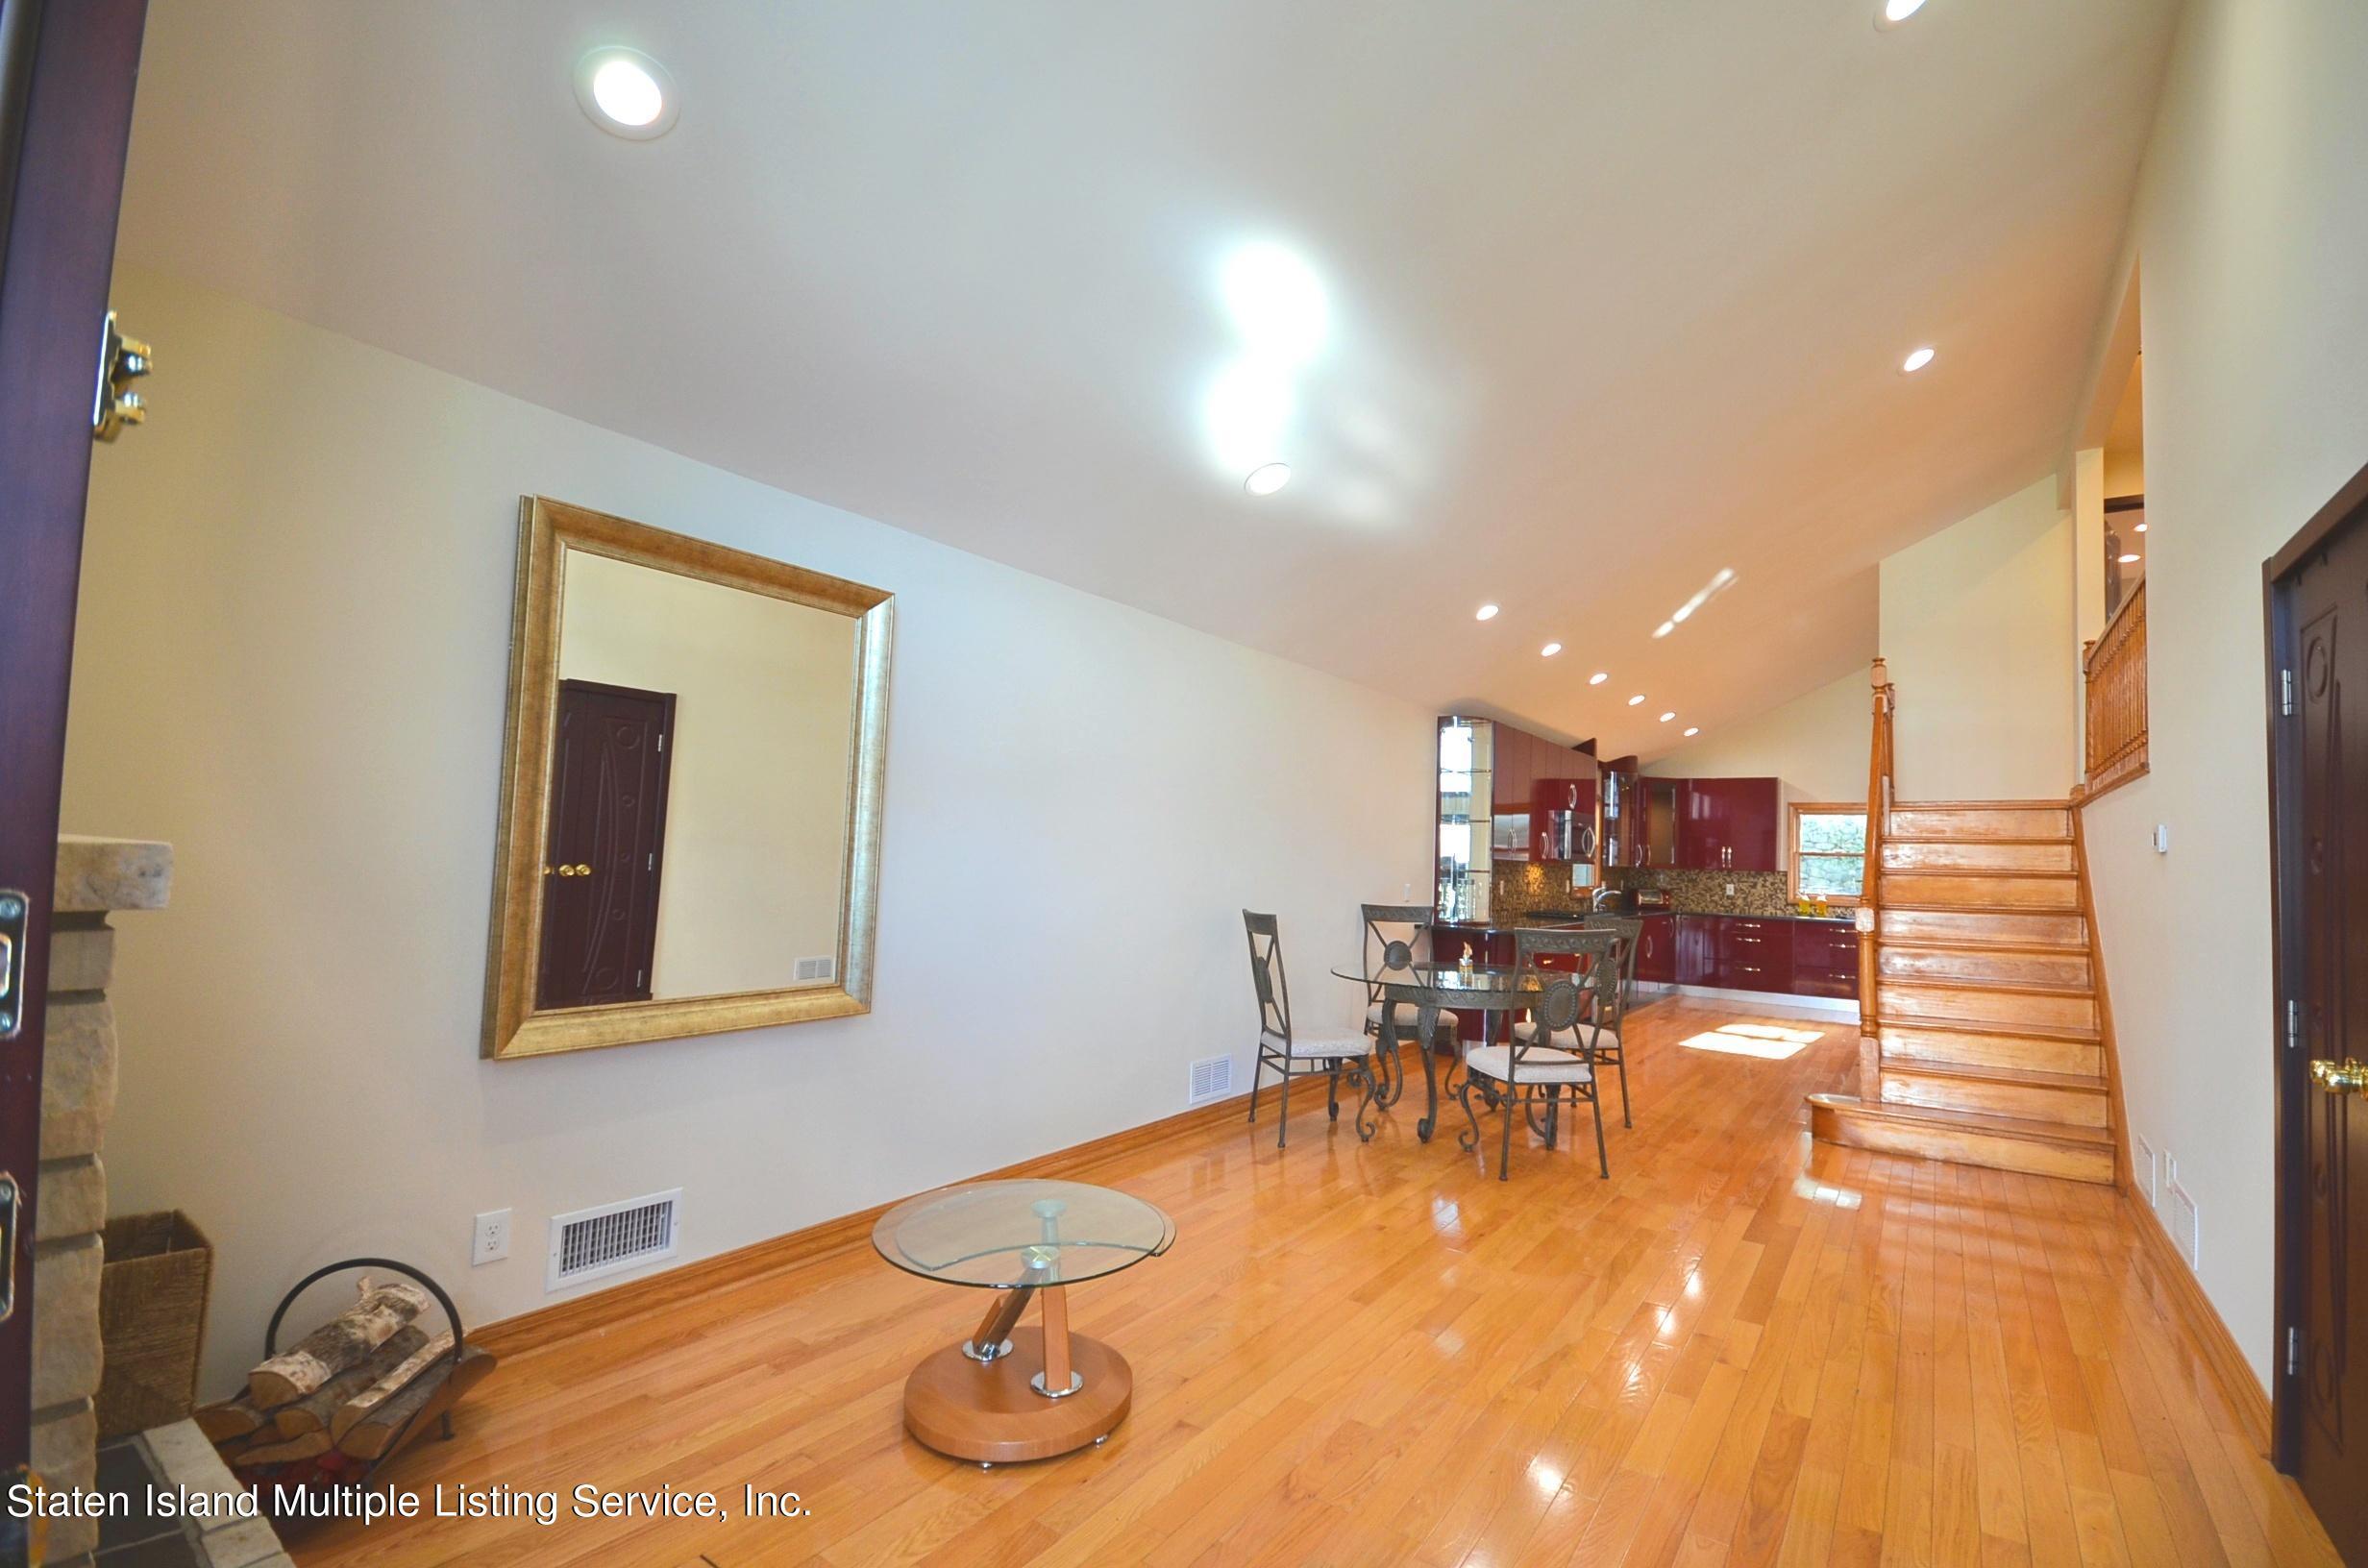 Single Family - Detached 48 Ocean Terrace  Staten Island, NY 10314, MLS-1142240-7